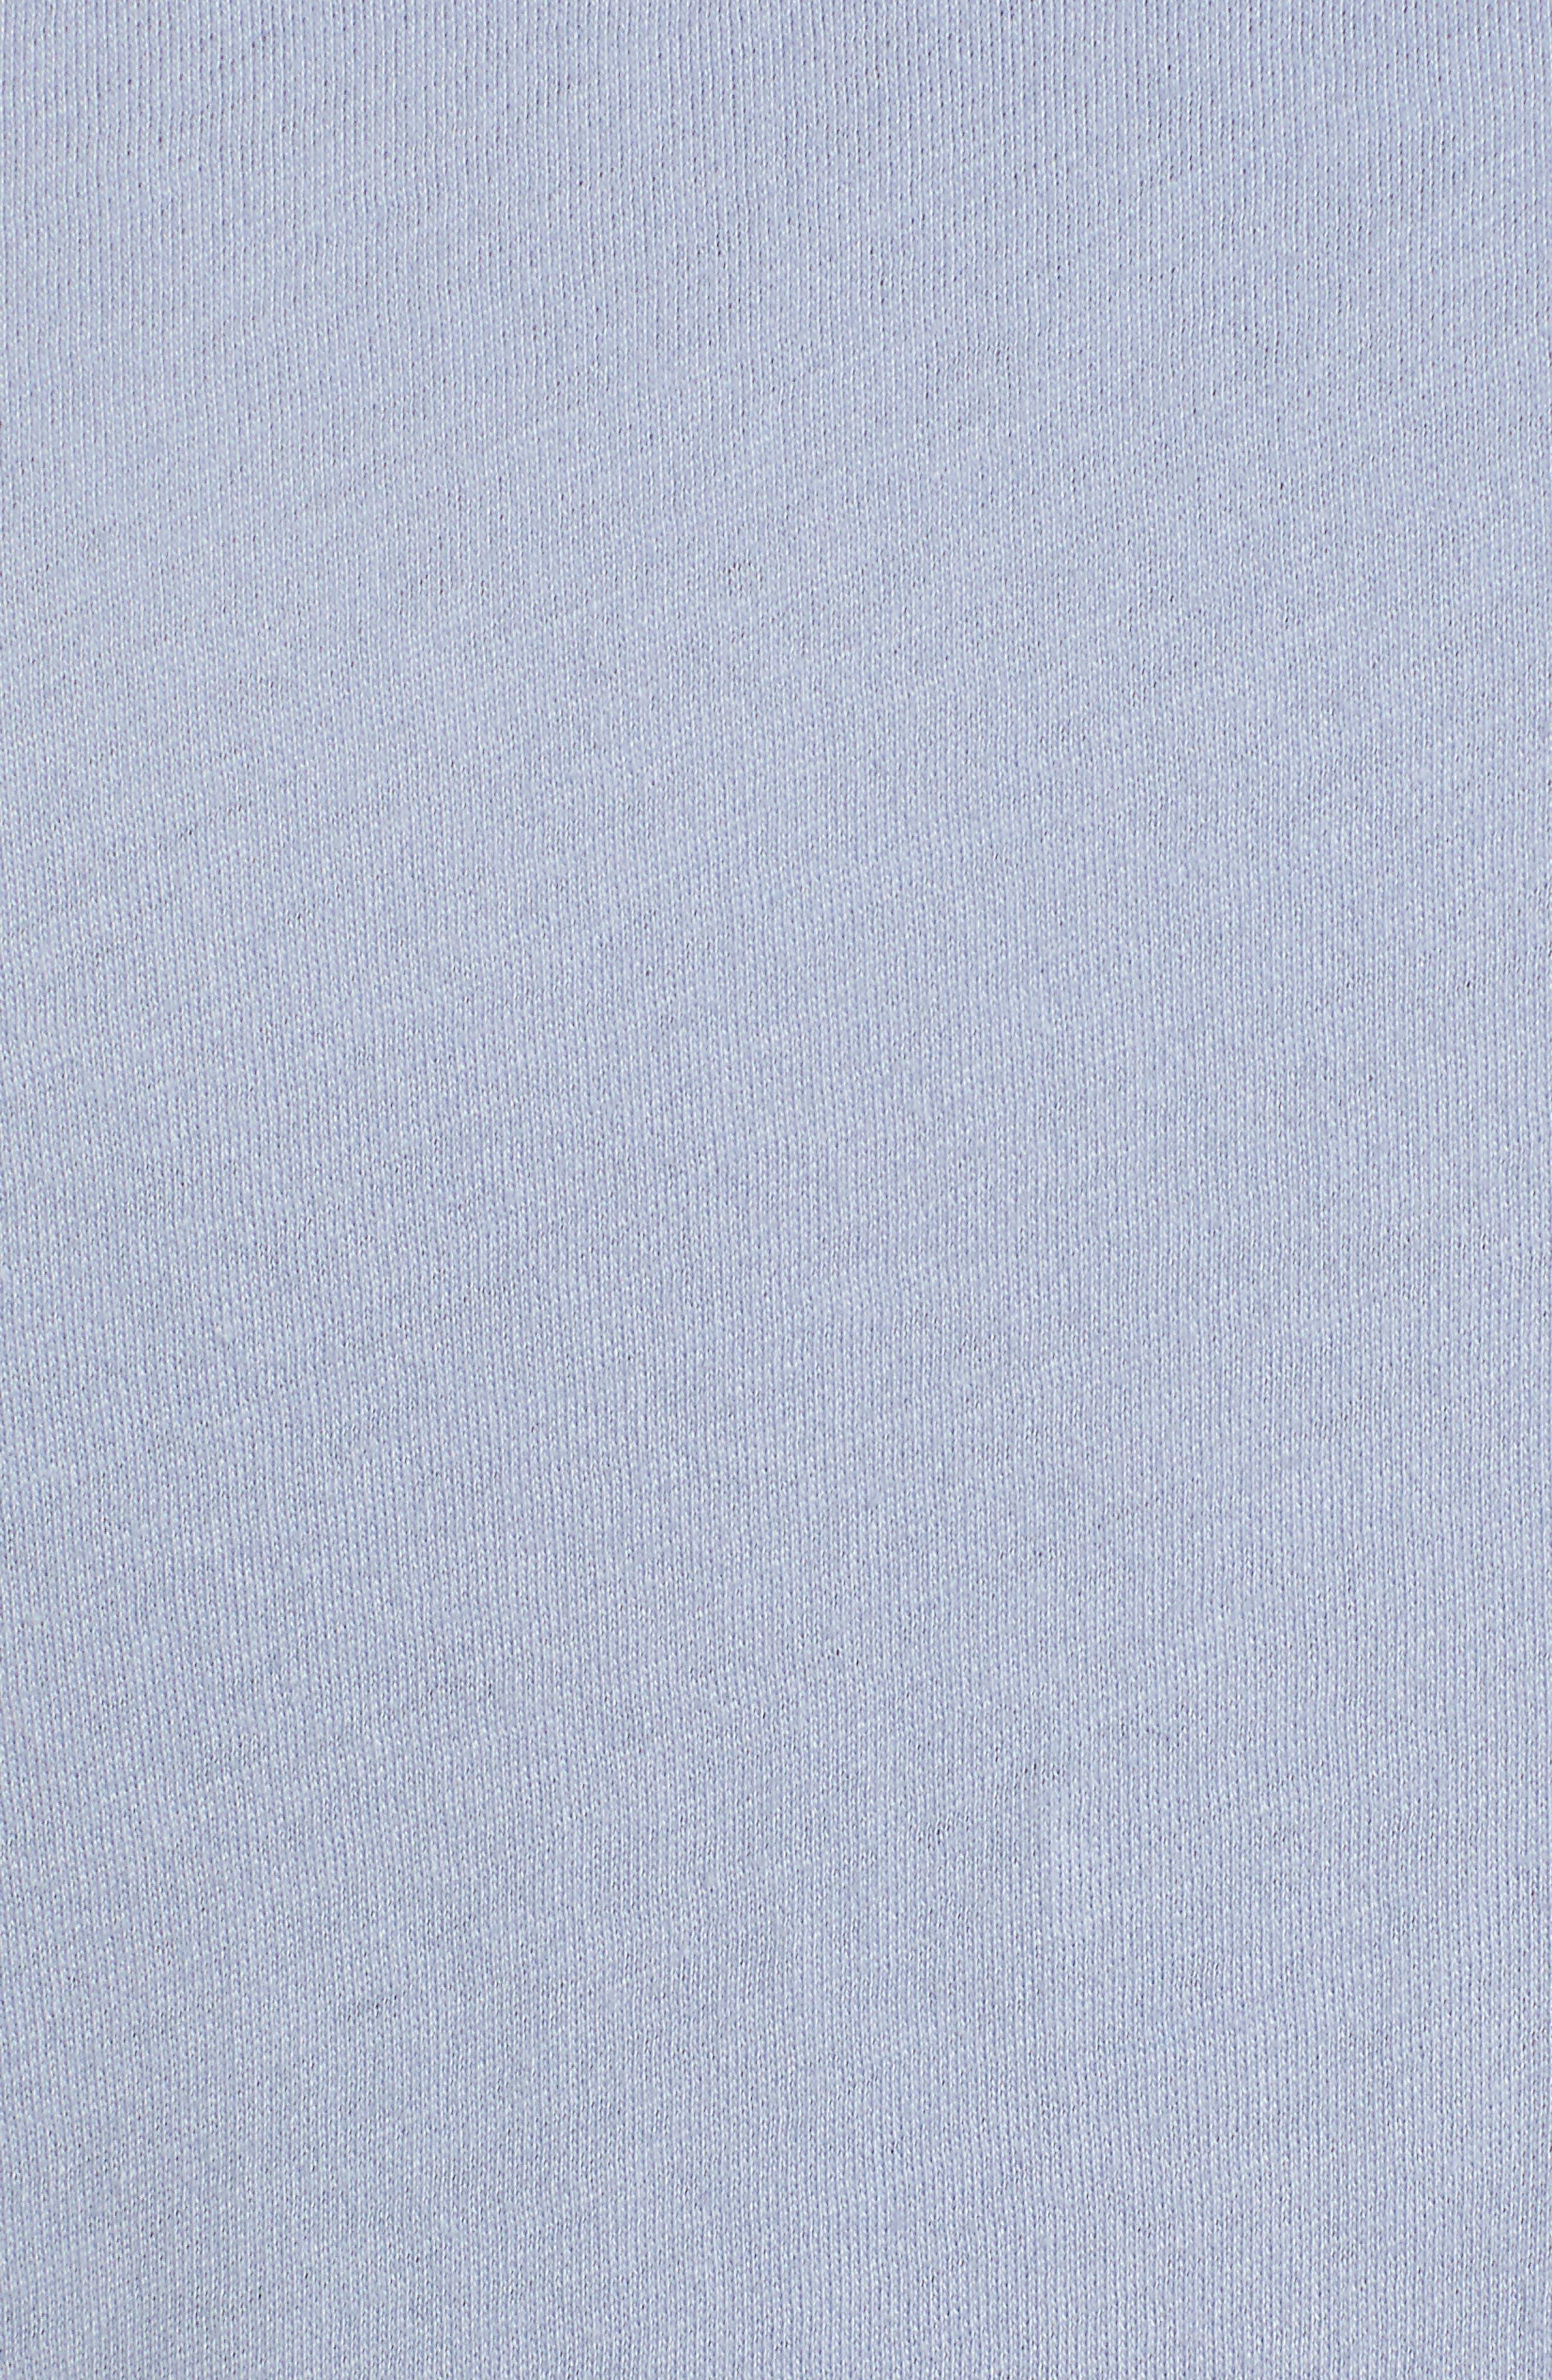 Mock Neck Cotton Tee,                             Alternate thumbnail 6, color,                             BLUE BRUNNERA